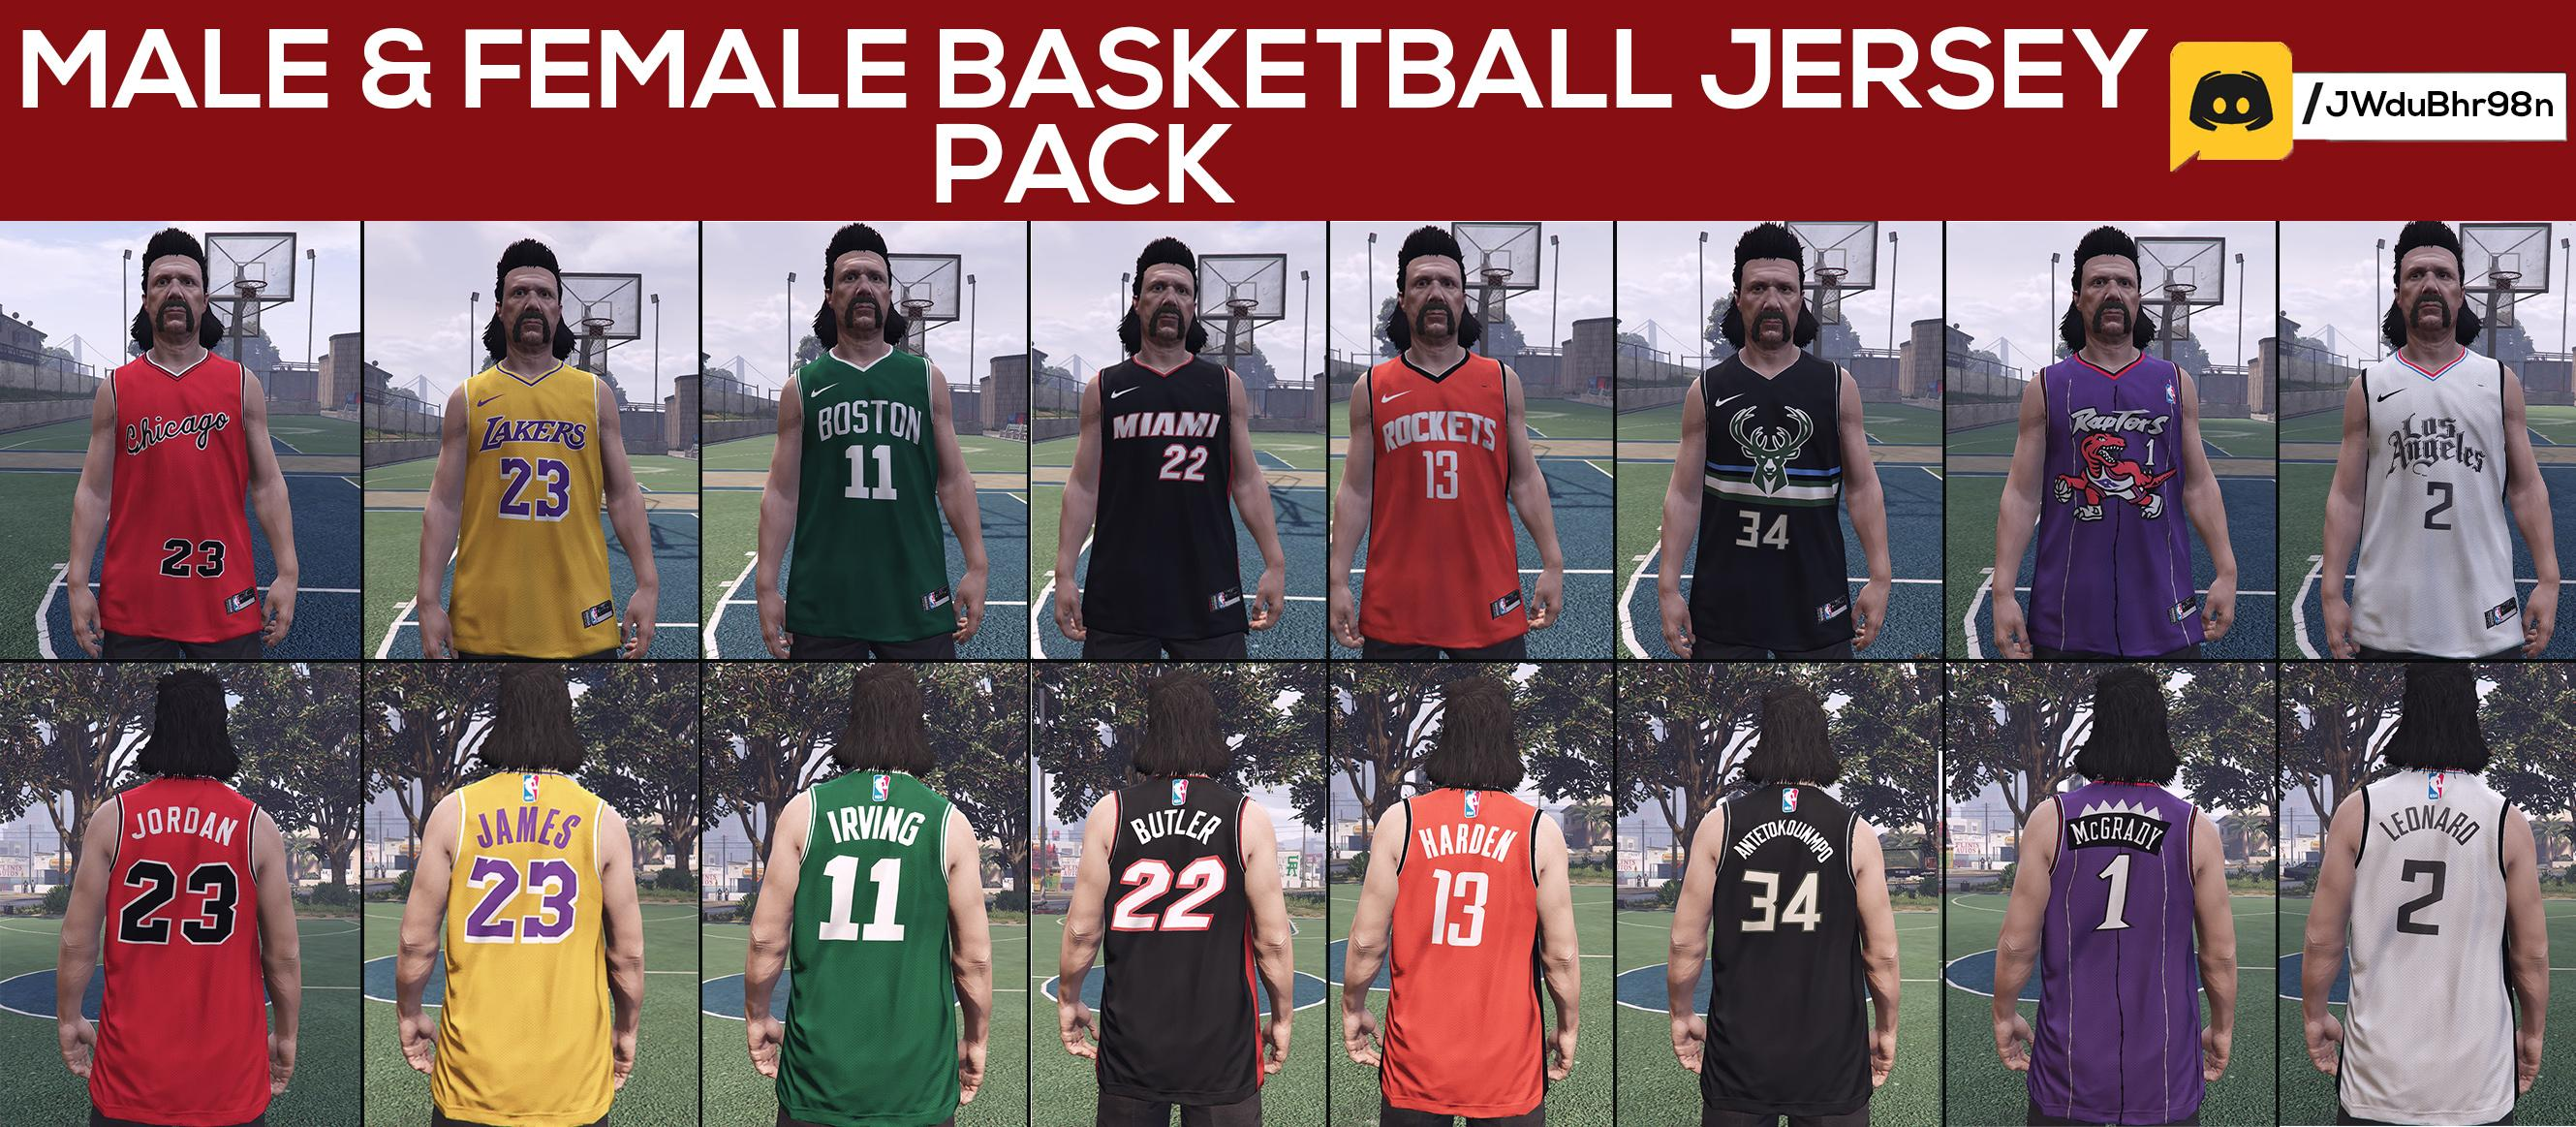 Male & Female Basketball Jersey Pack - GTA5-Mods.com